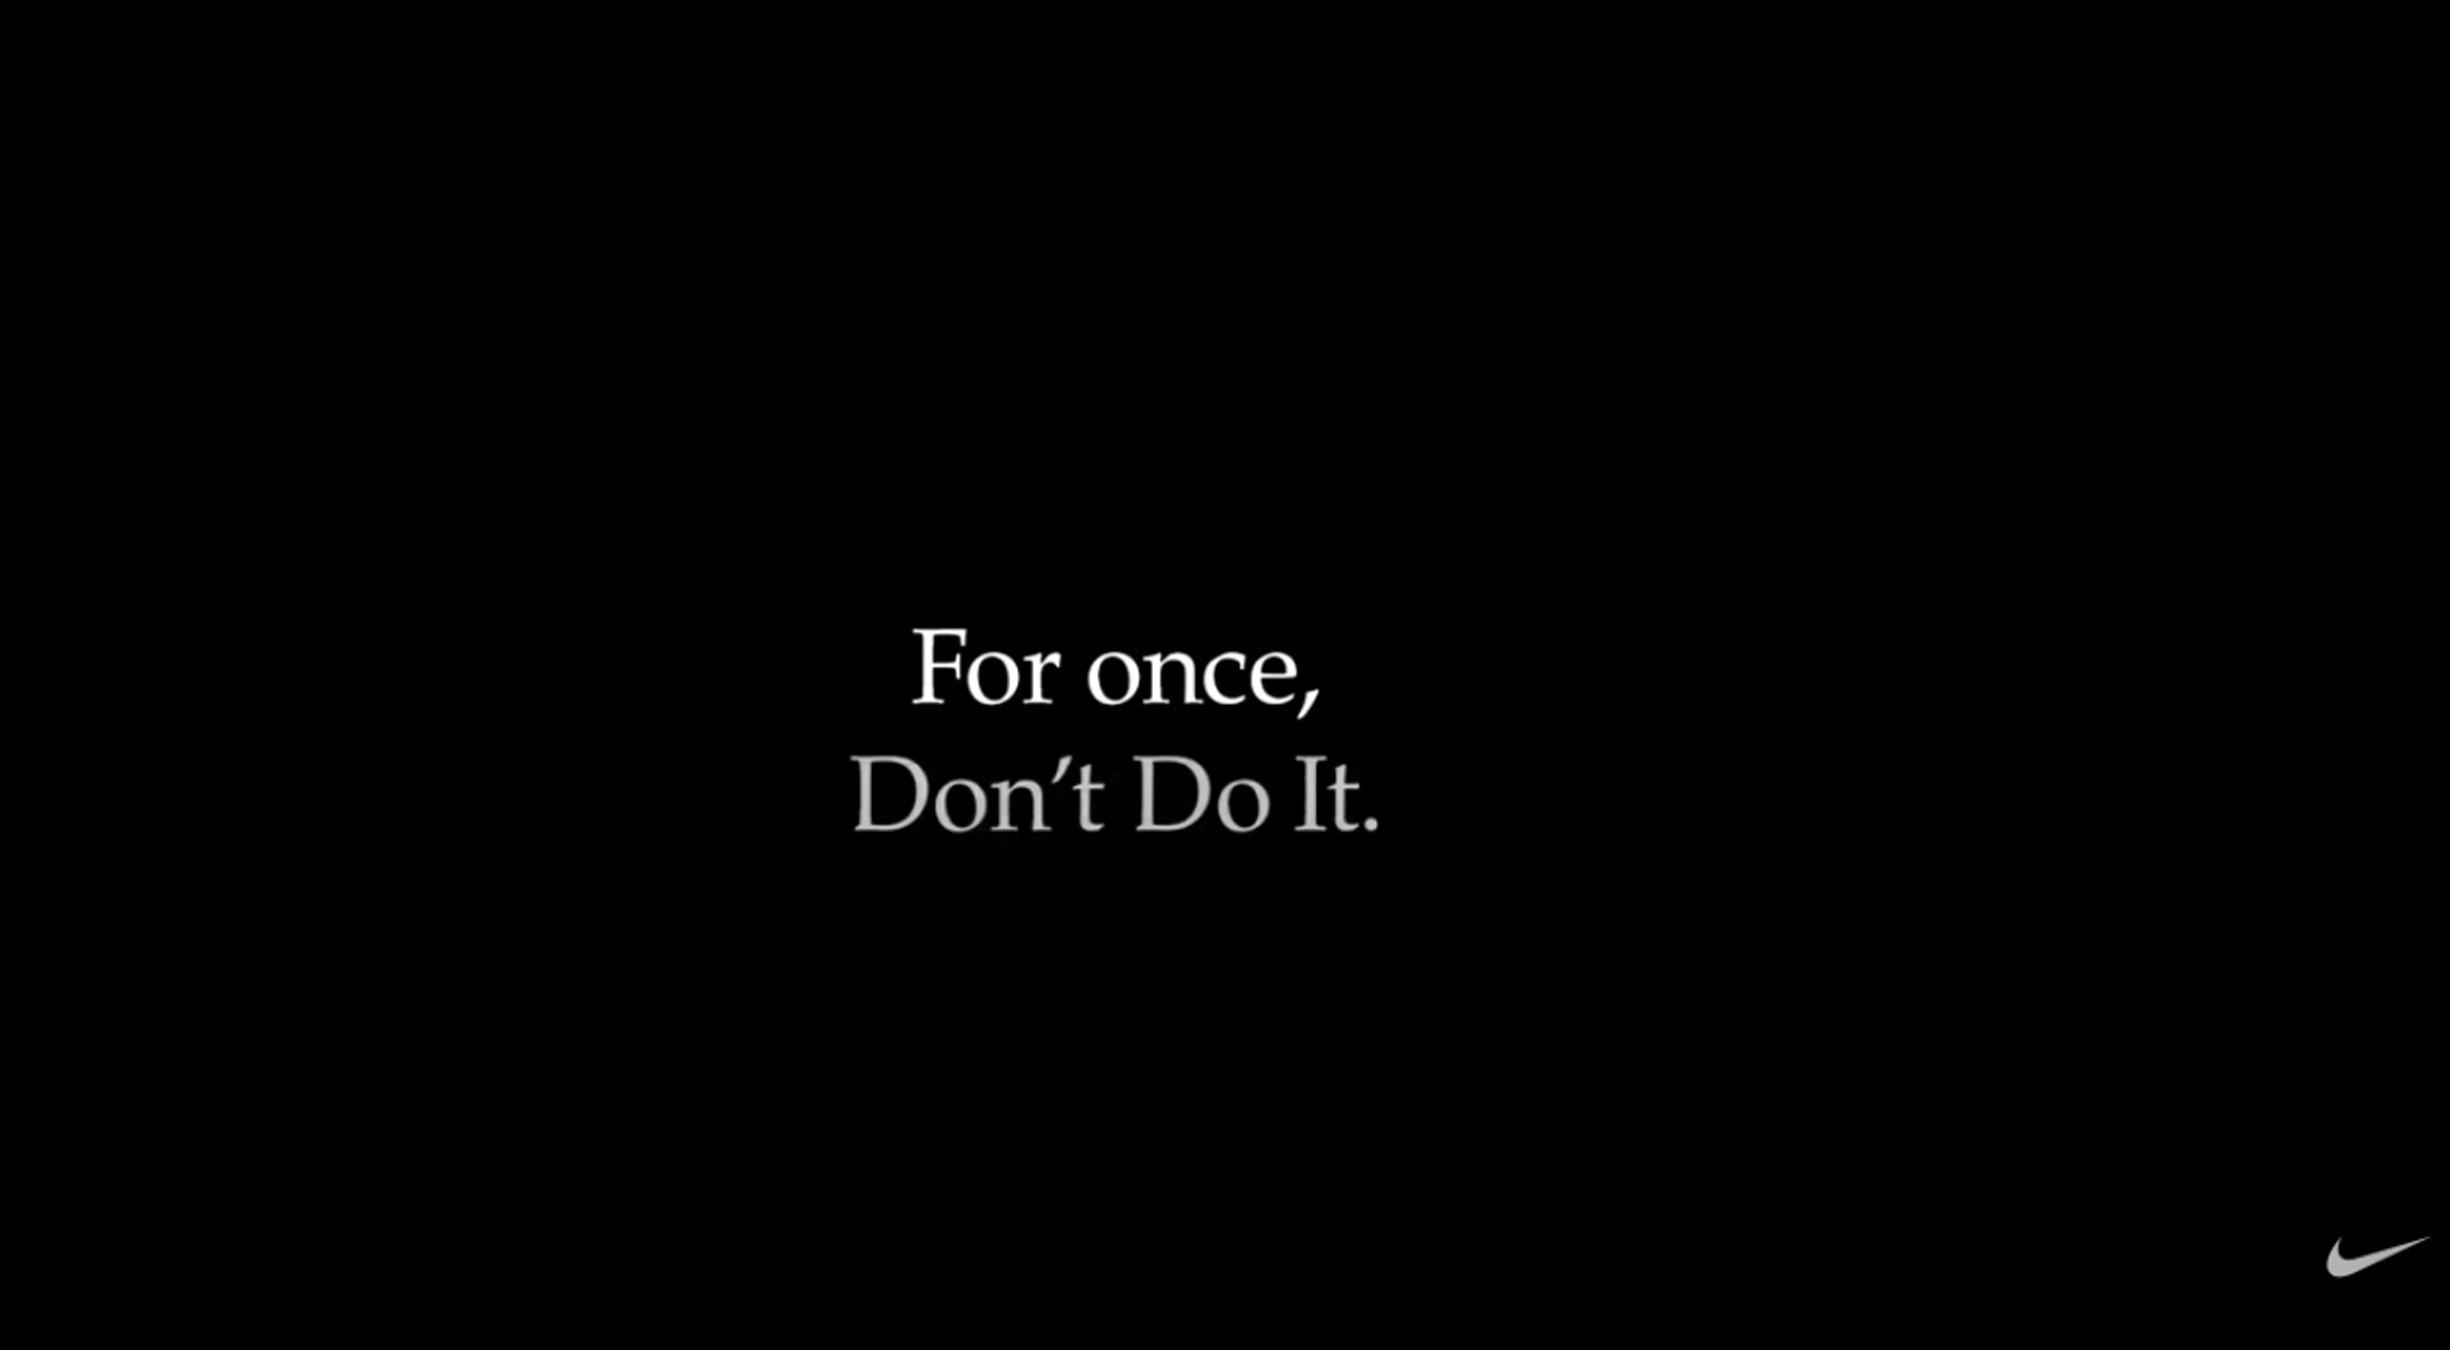 Don't Do It: Συγκλονίζει η Nike για τον Τζόρτζ Φλόιντ και η Adidas κάνει… retweet